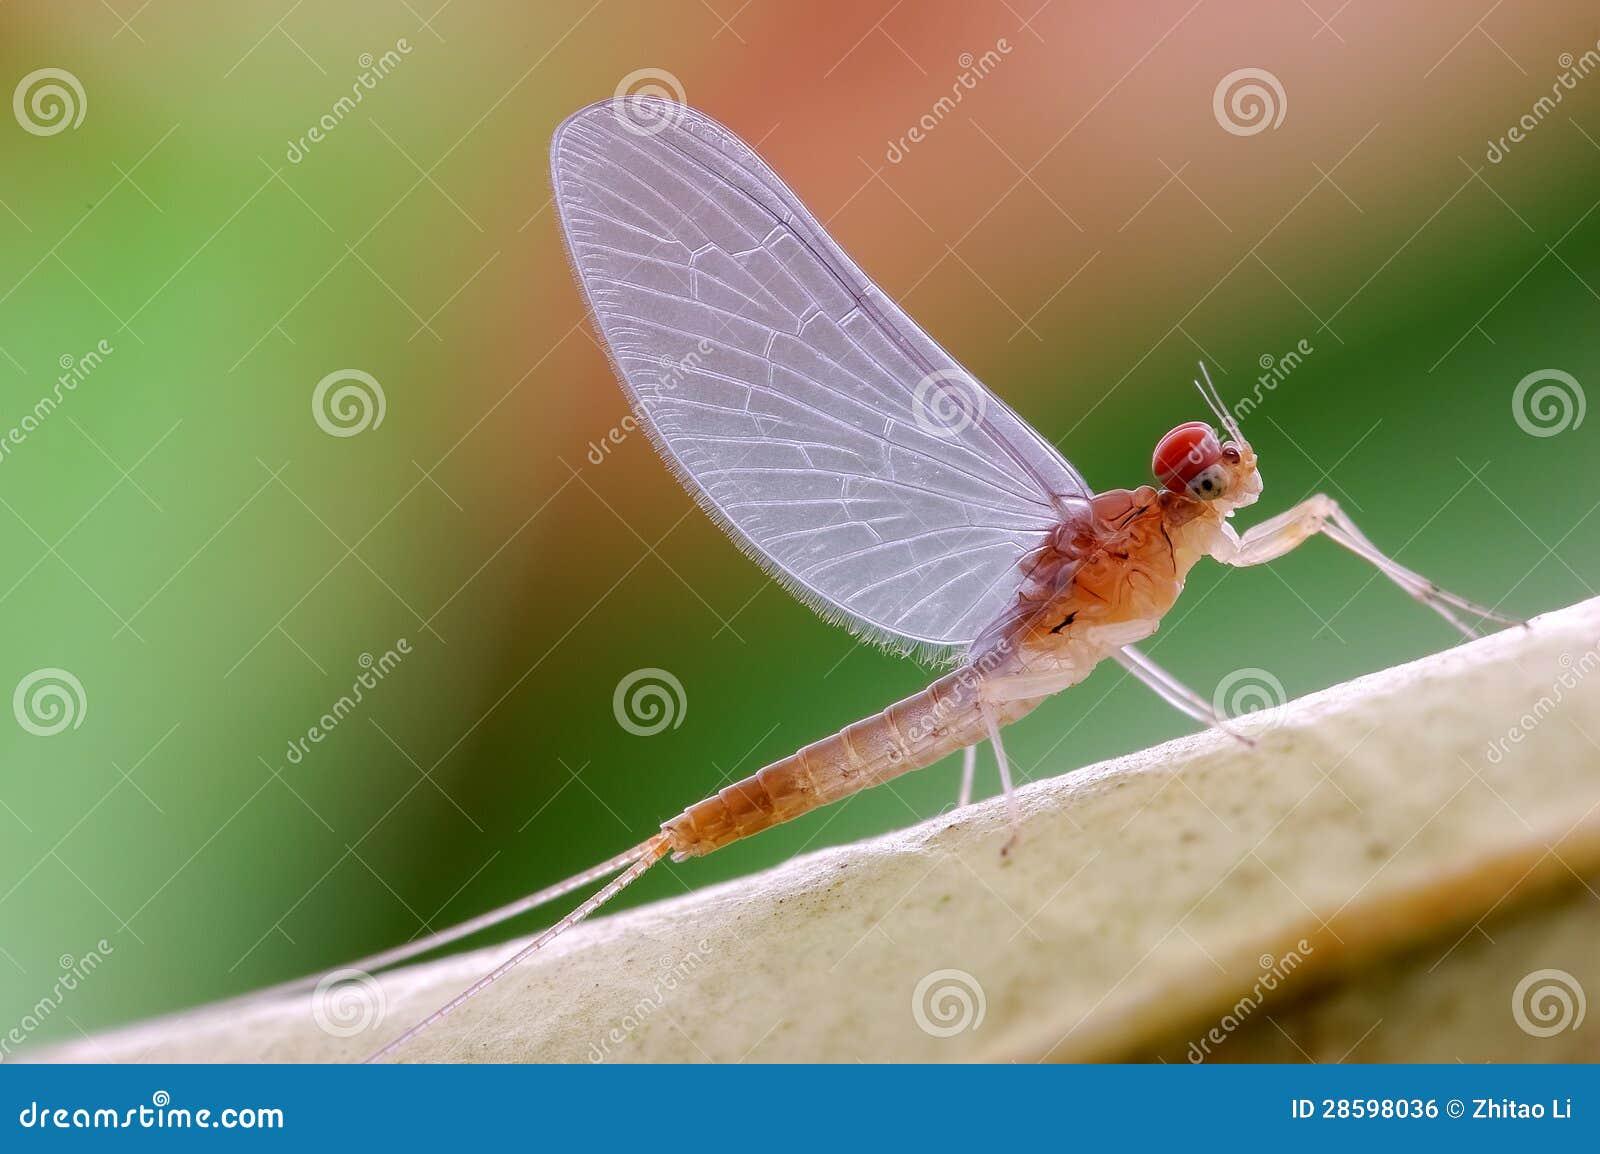 Efímera o Ephemeroptera